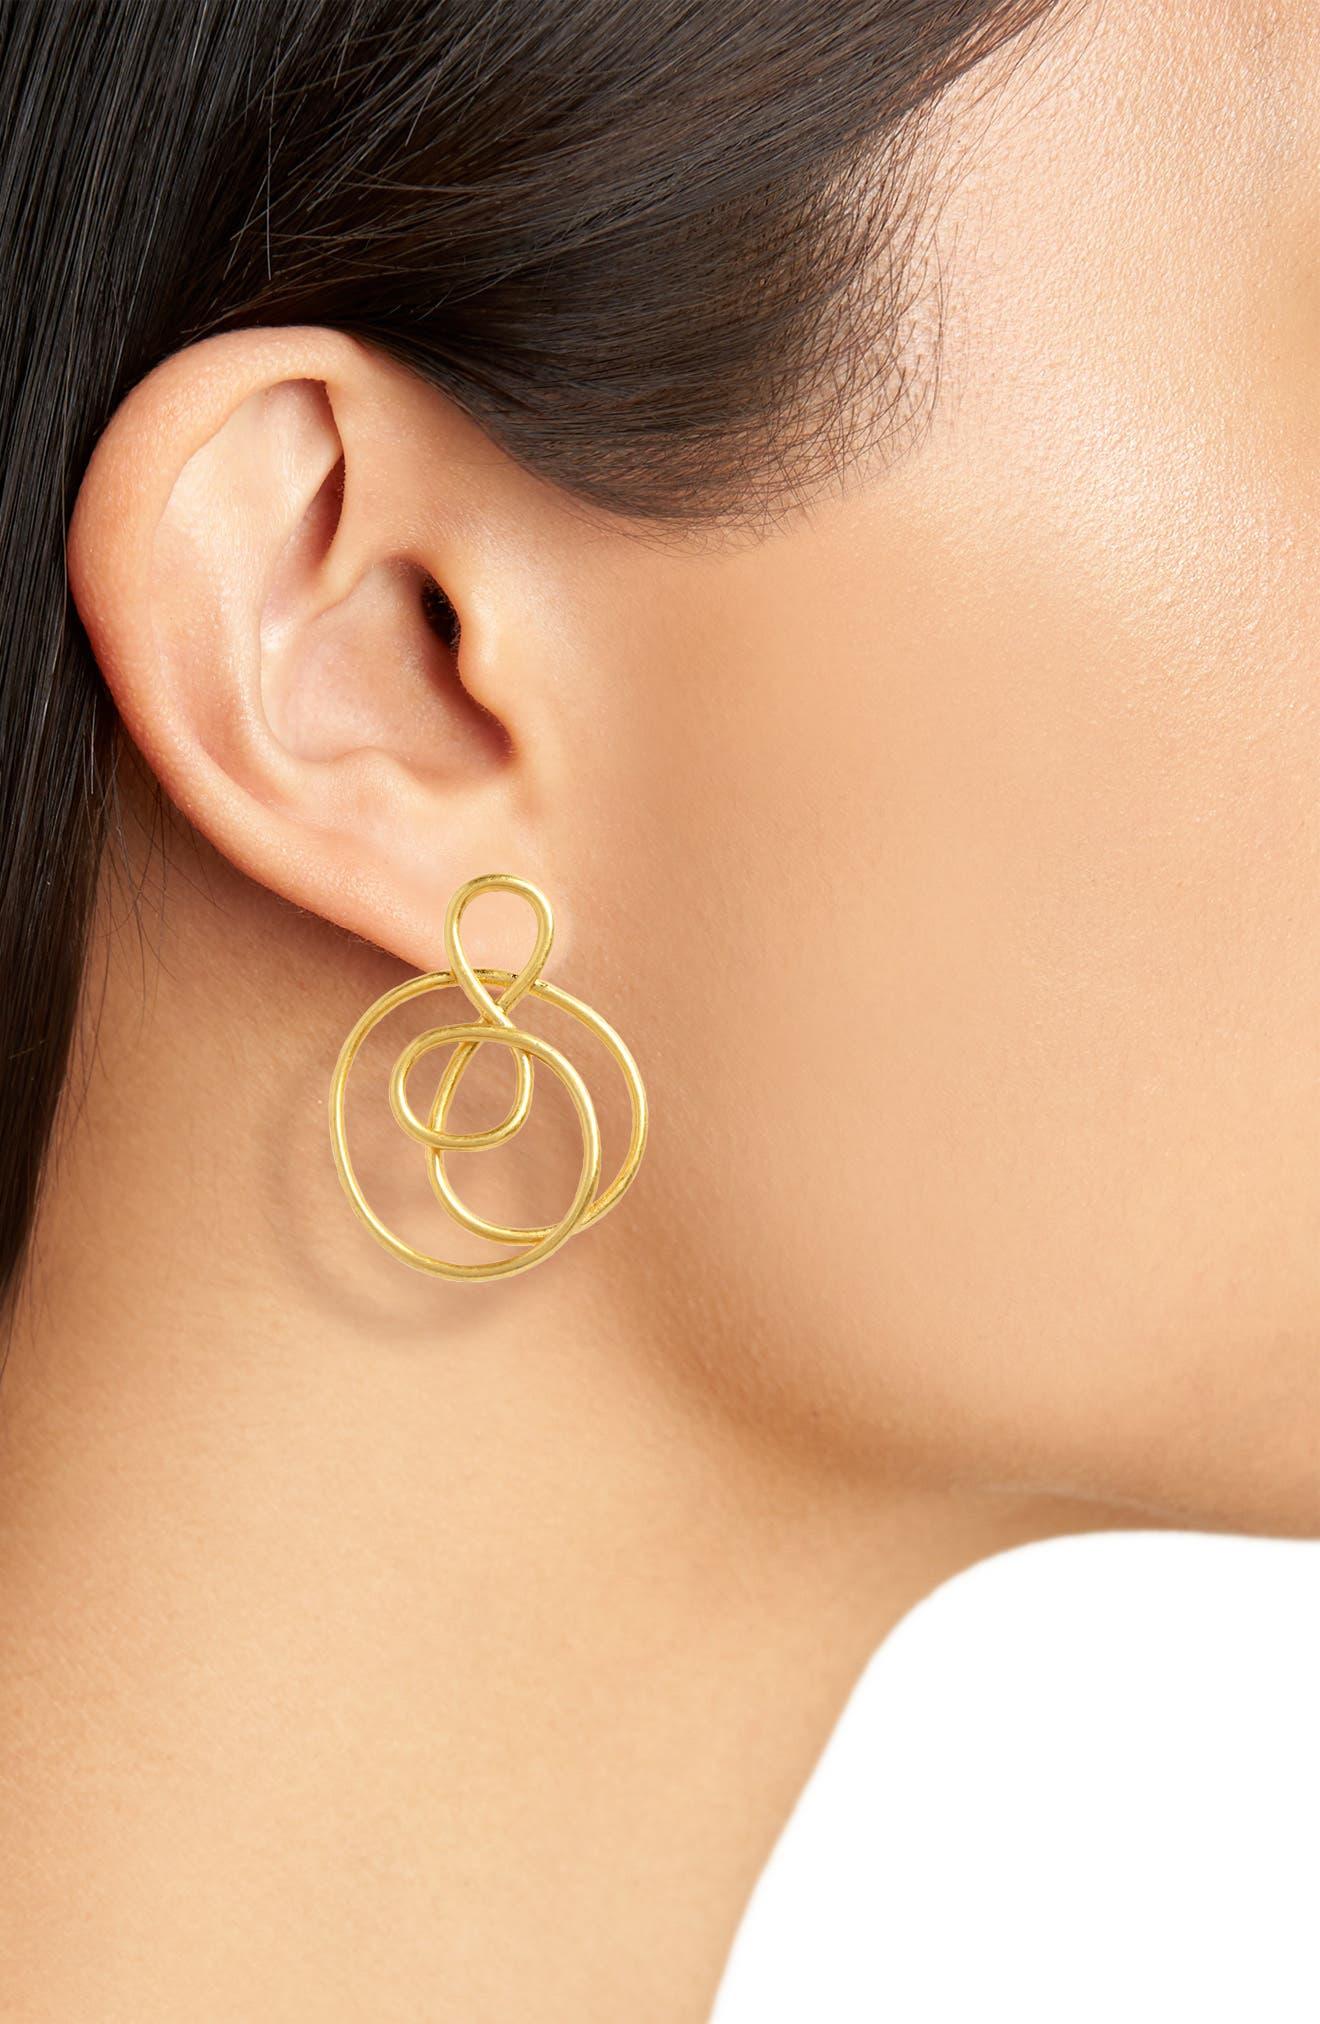 Treble Twist Earrings,                             Alternate thumbnail 2, color,                             VINTAGE GOLD